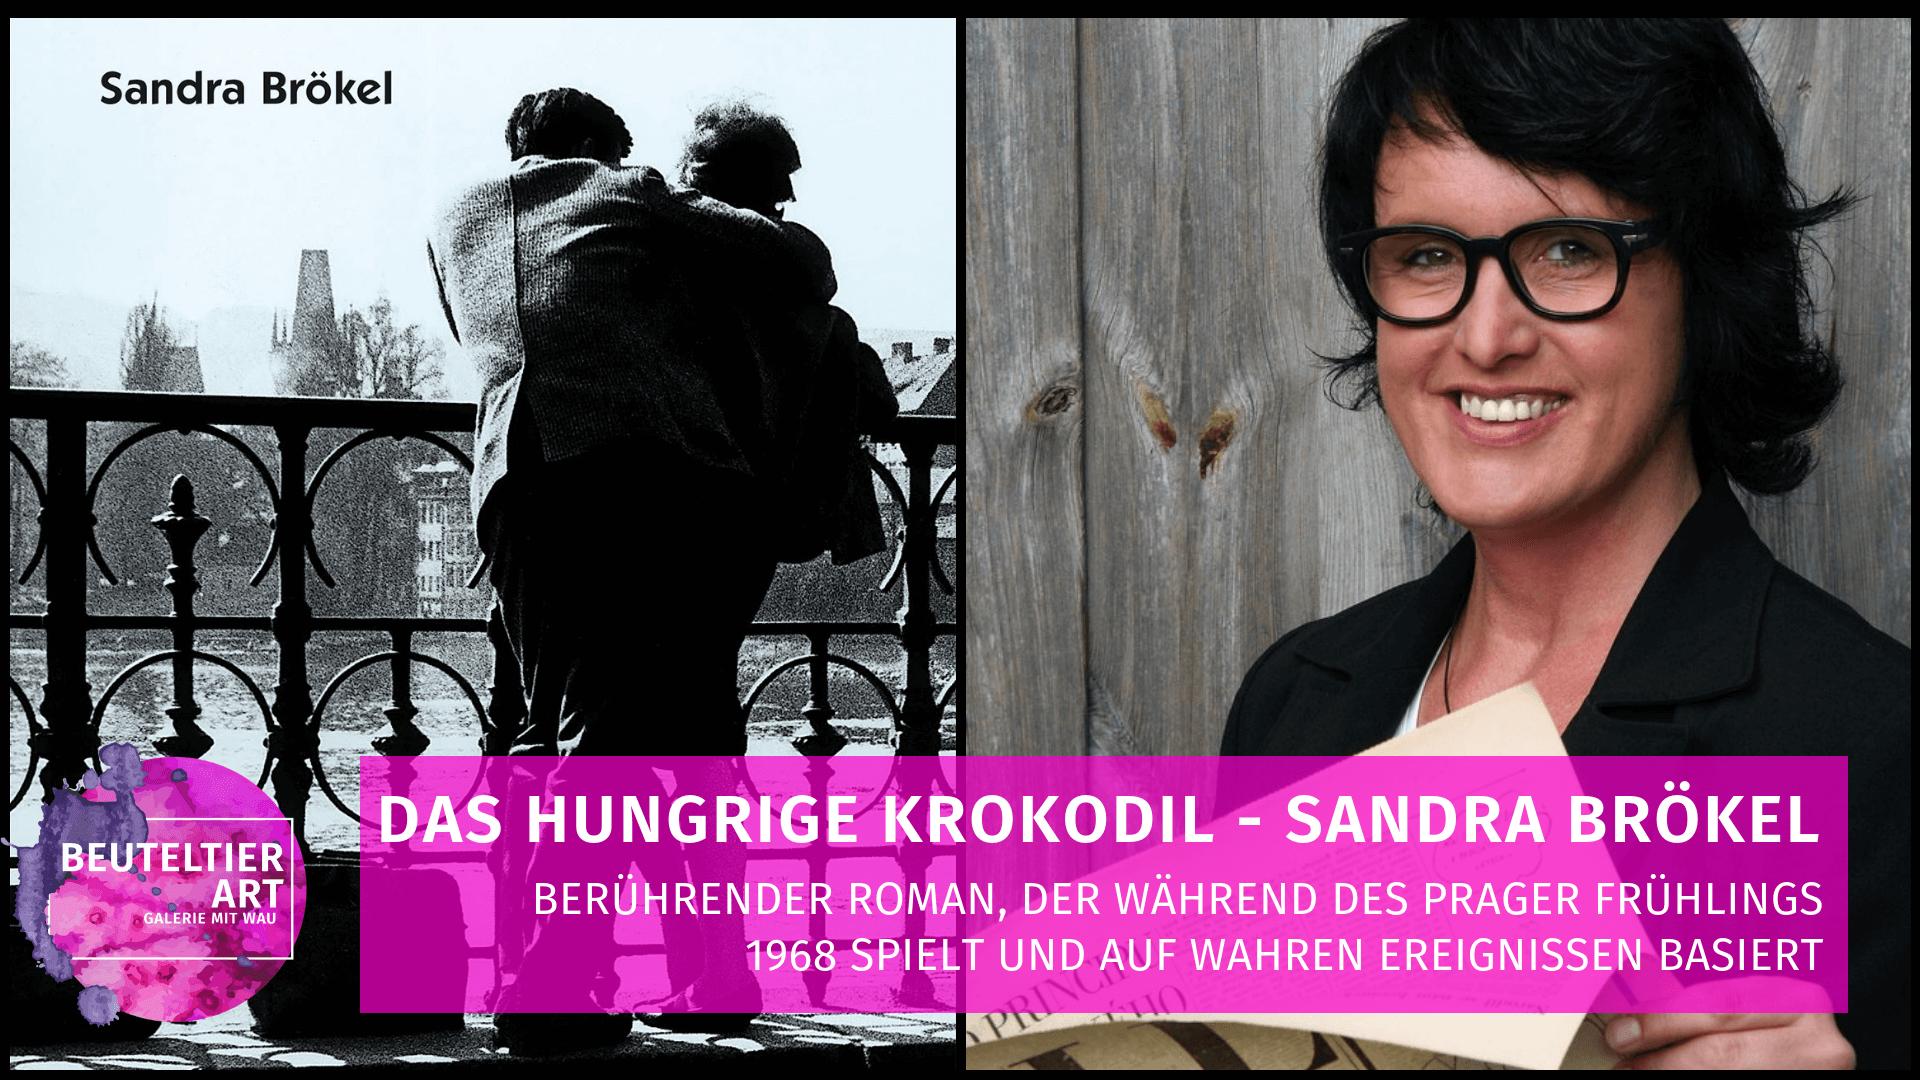 Das hungrige Krokodil - Lesung von Sandra Brökel